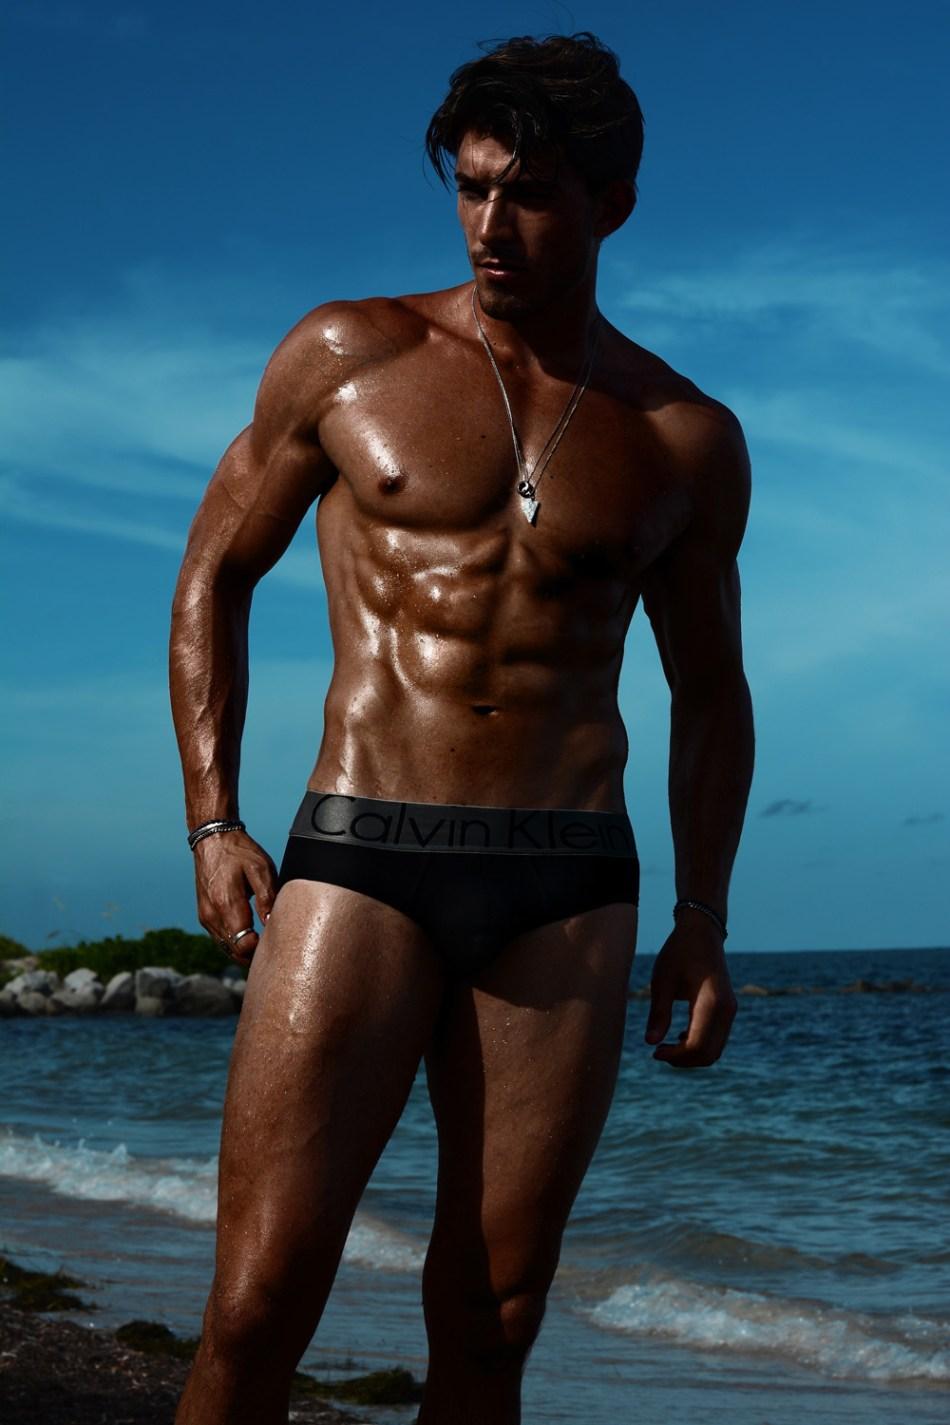 Payton Clarke by Stevan Reyes4